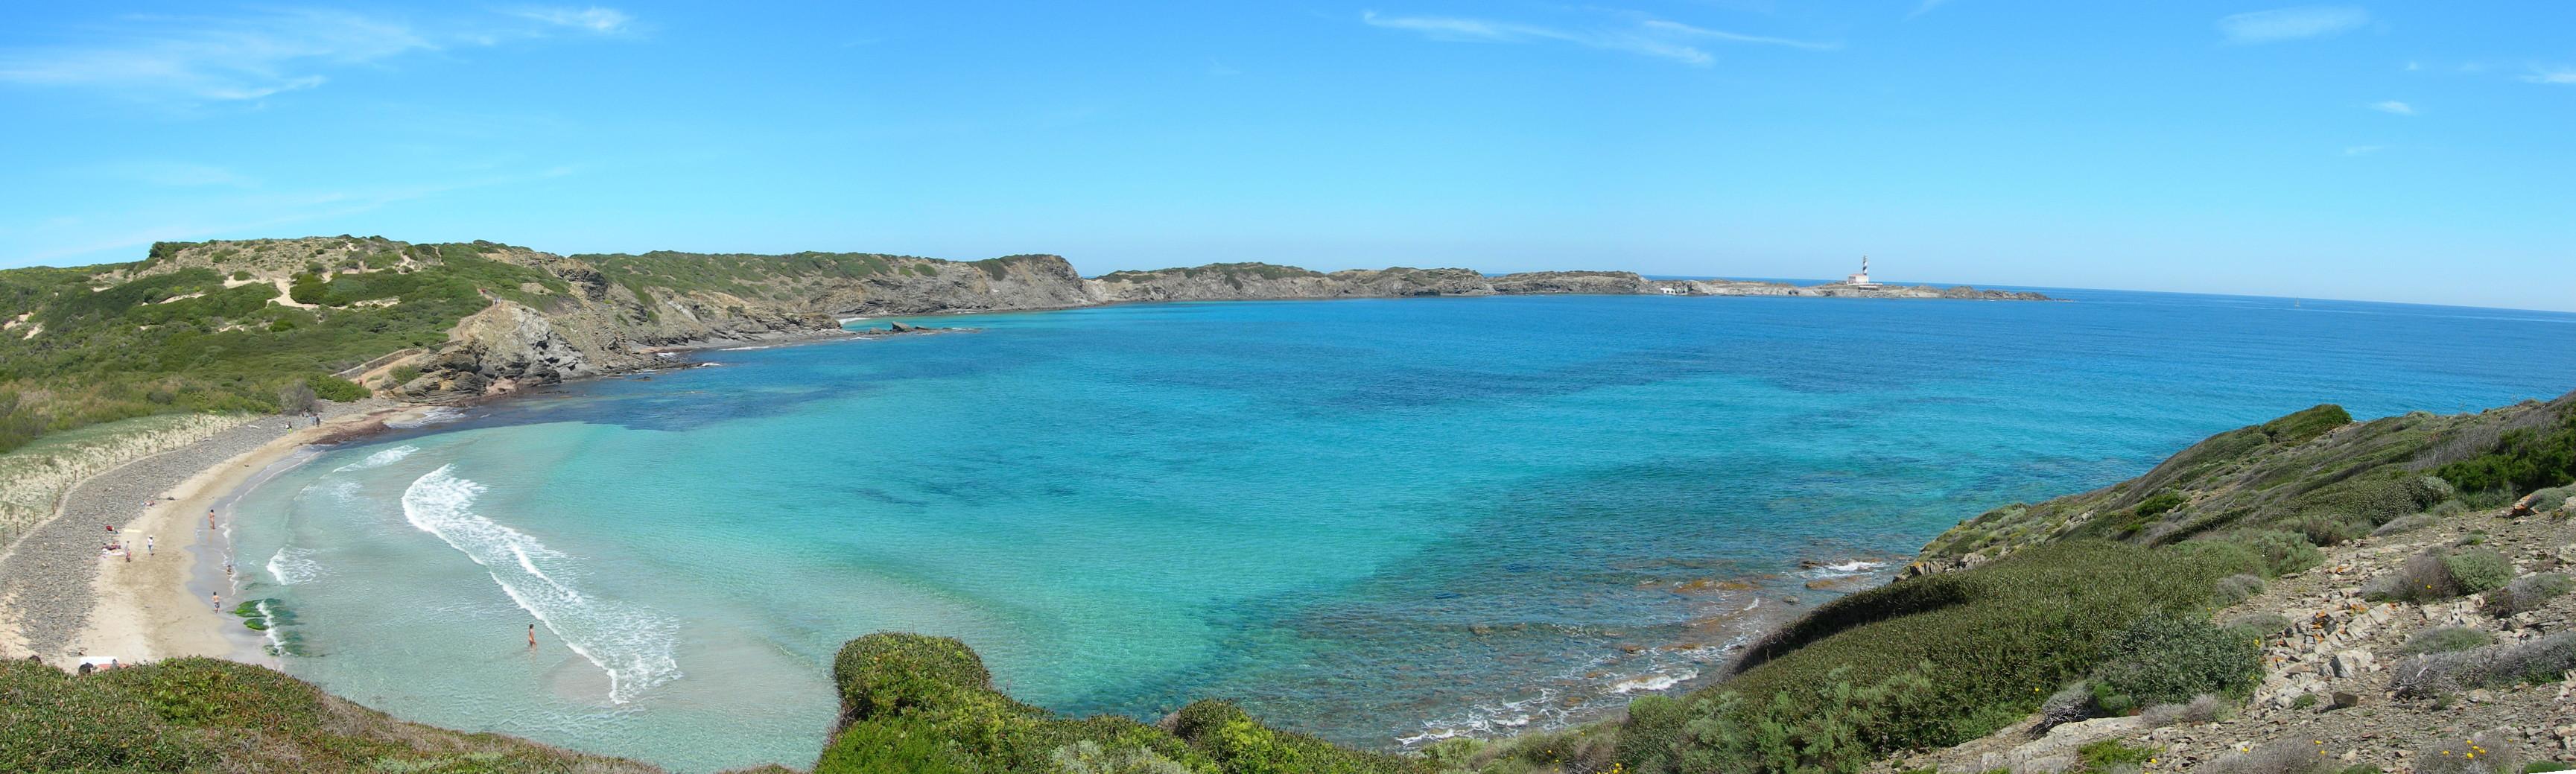 Foto playa Cala Morella Nou. Panorámica Cala Tortuga y Cabo de Favaritx. Costa E. de Menorca.-